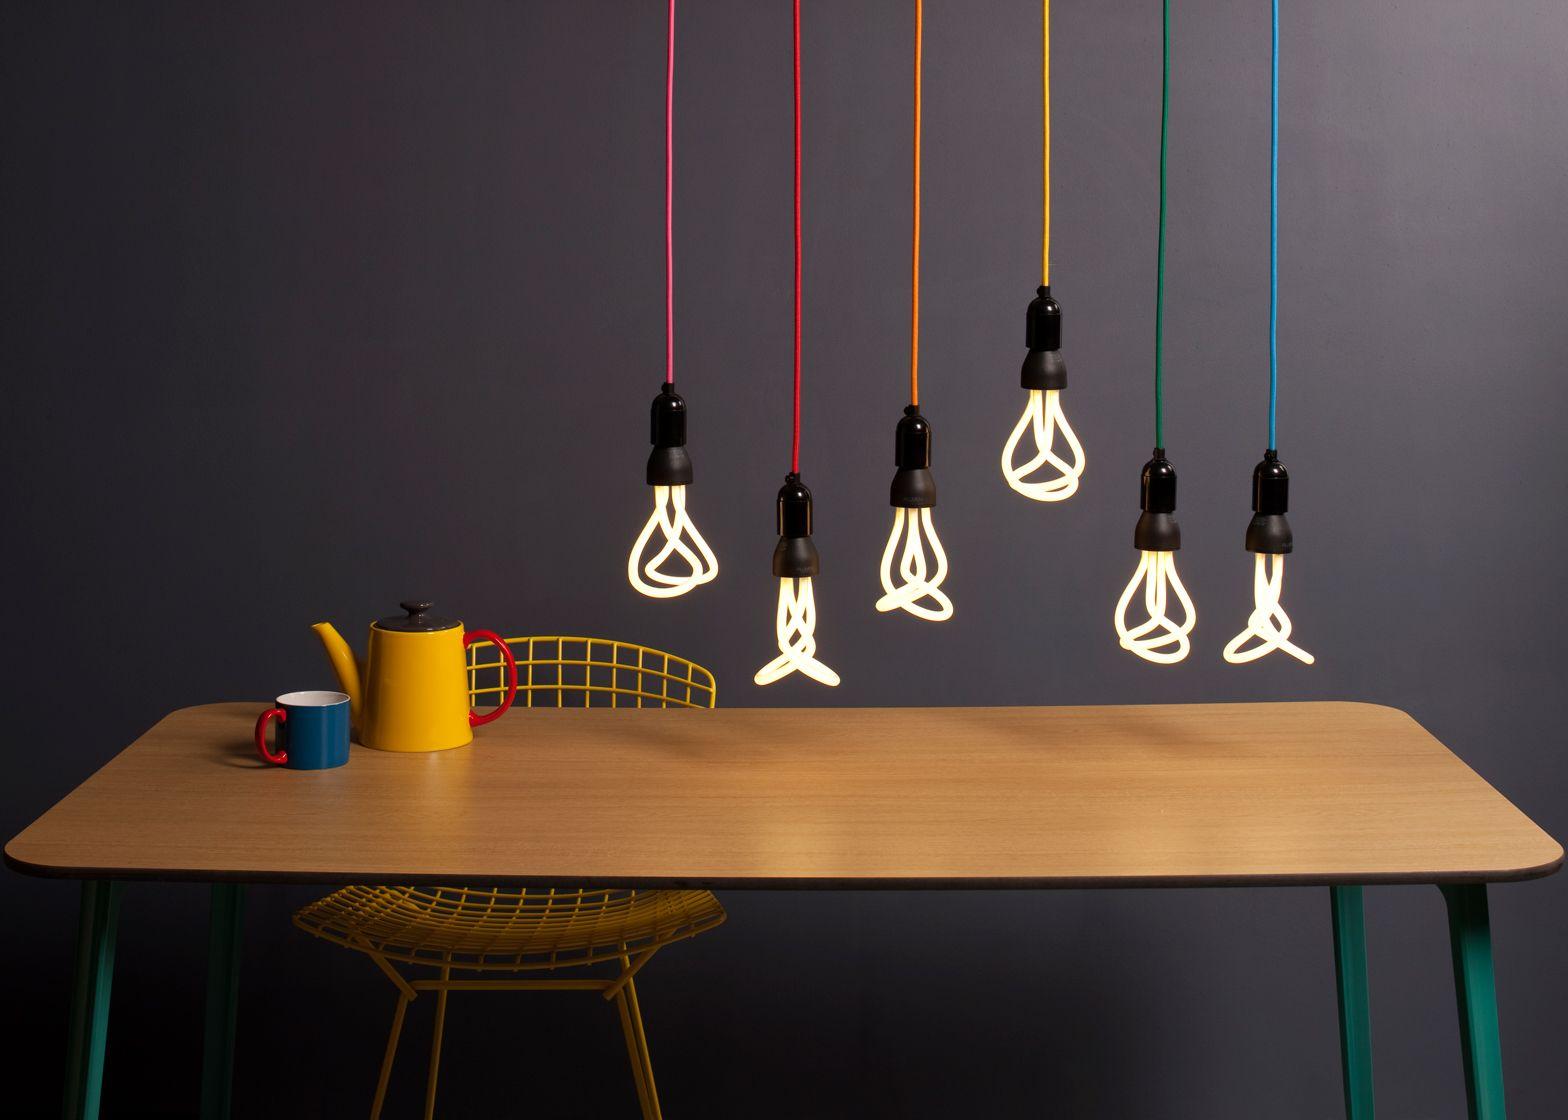 Plumen Seeks Small Investors To Fund New Lighting Product Launches Plumen Plumen Light Luxury Lighting